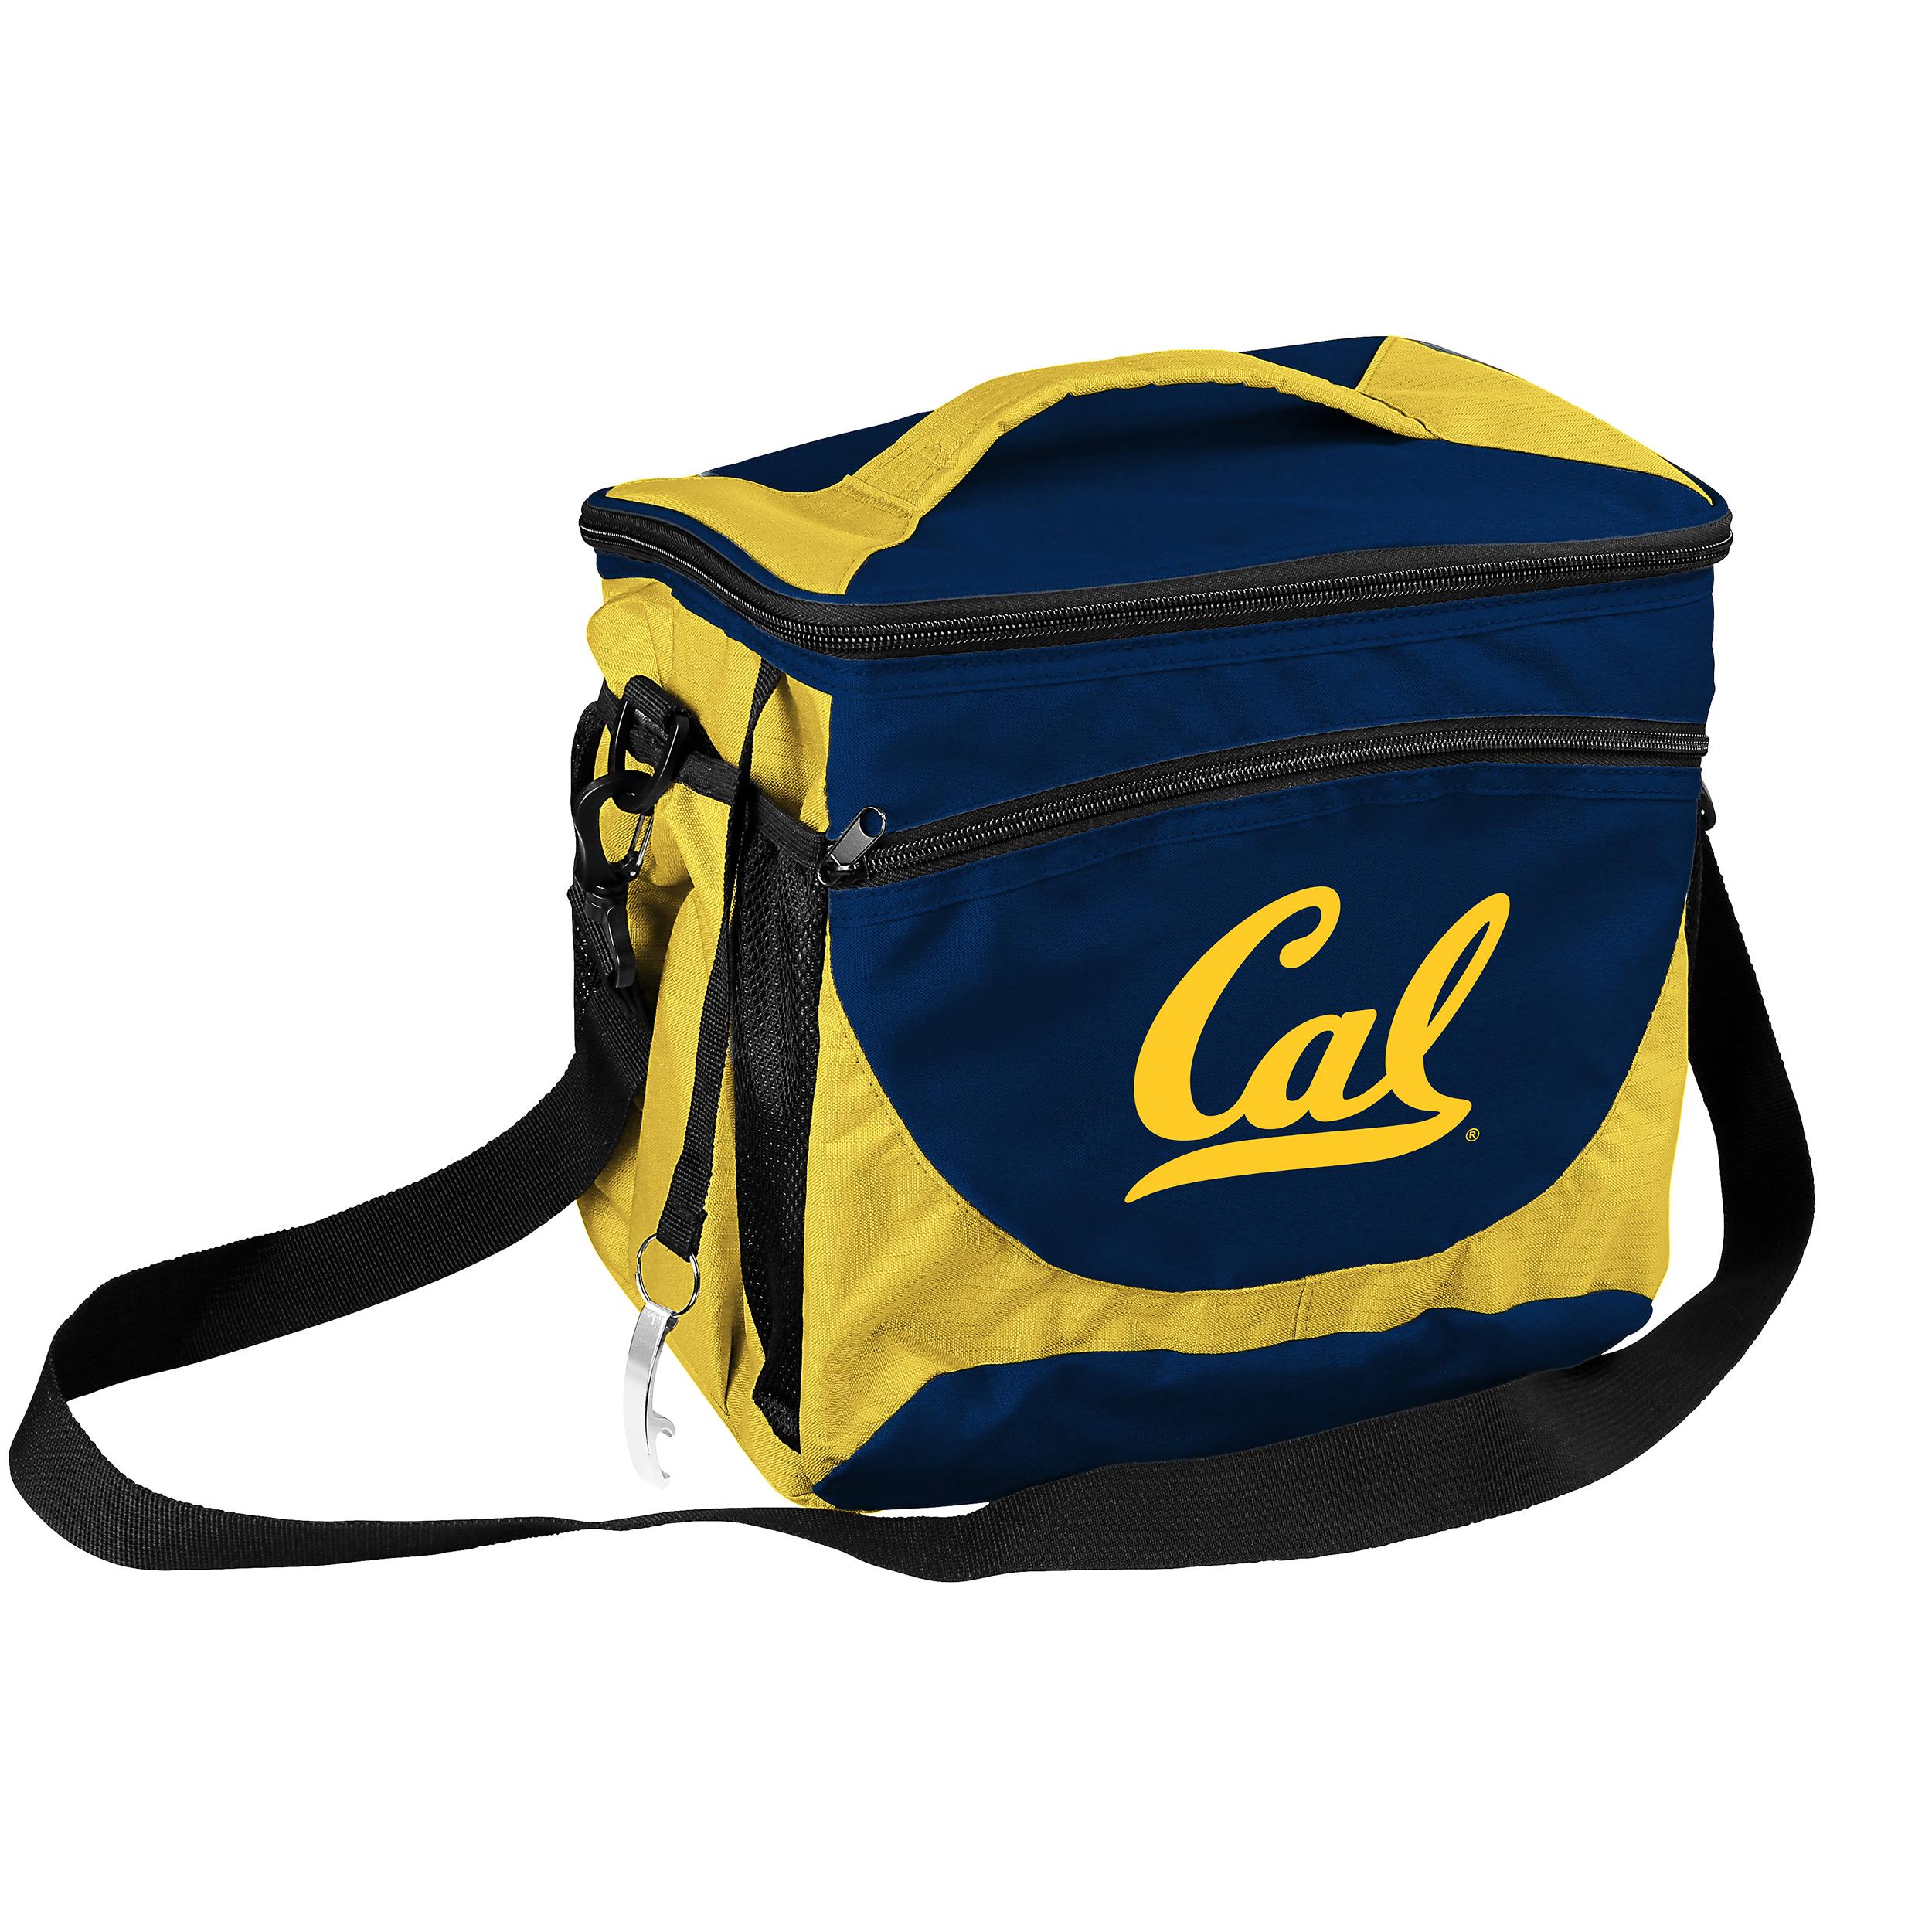 University of California Berkeley 24 Can Cooler